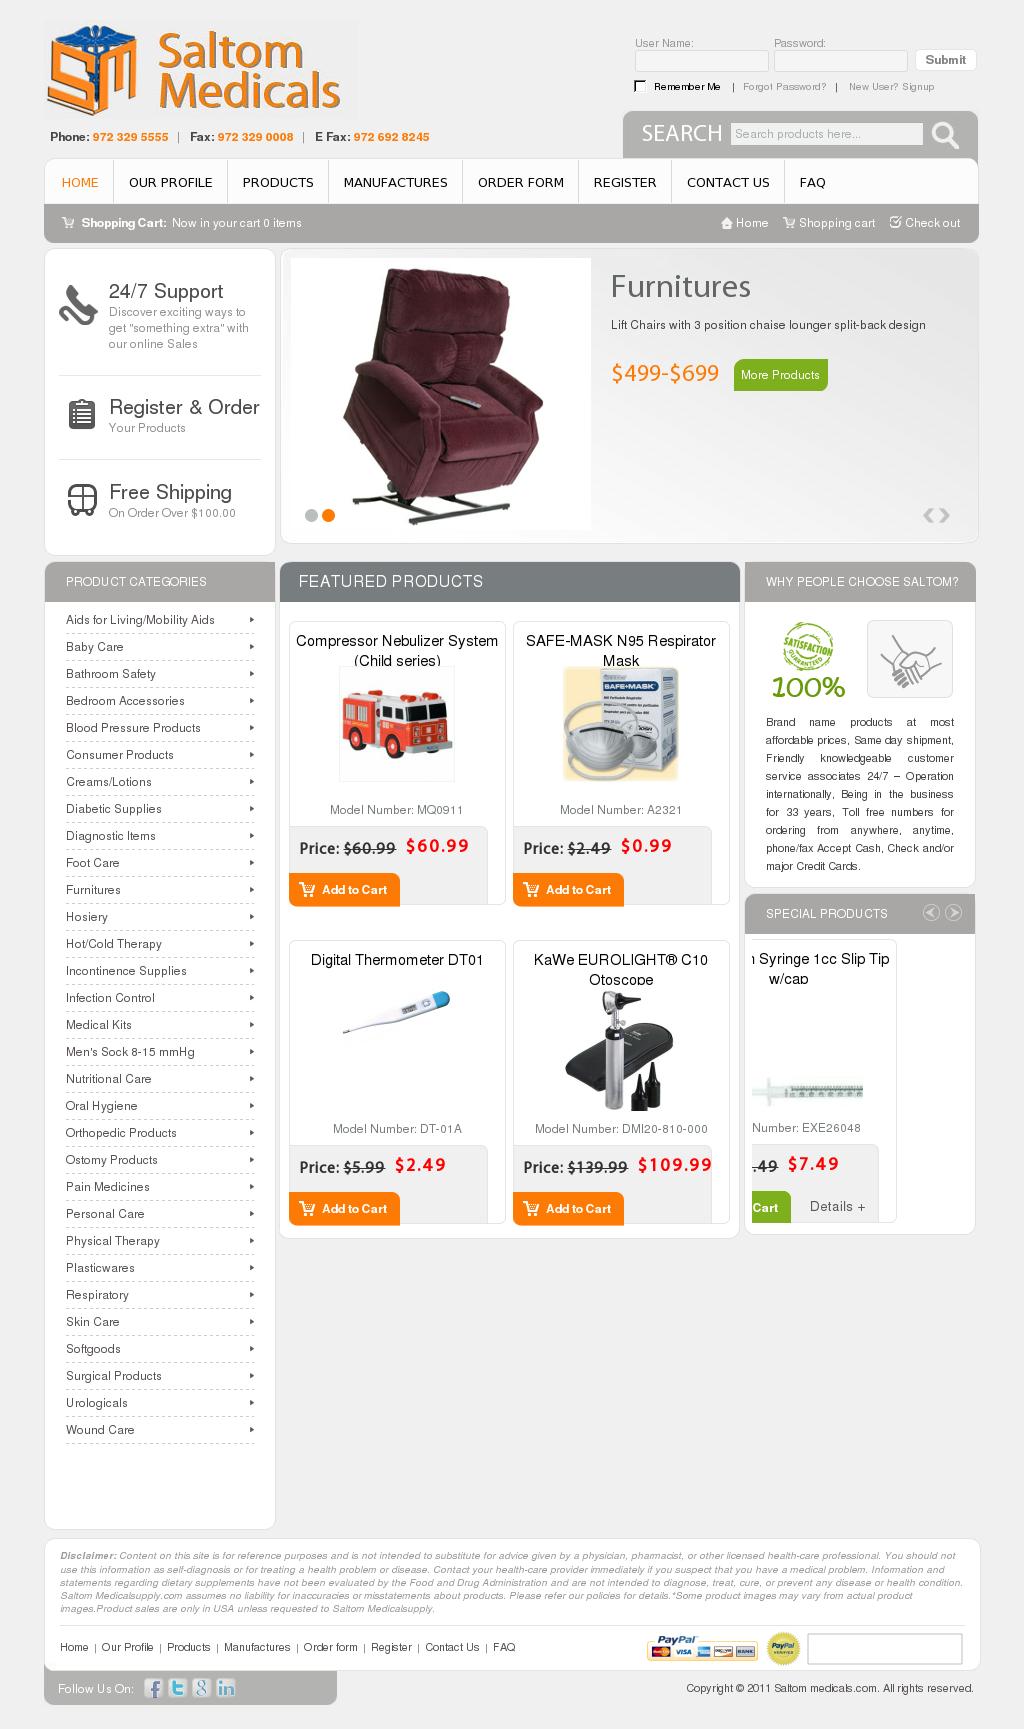 Saltom Medical Eqpt Trading Competitors, Revenue and